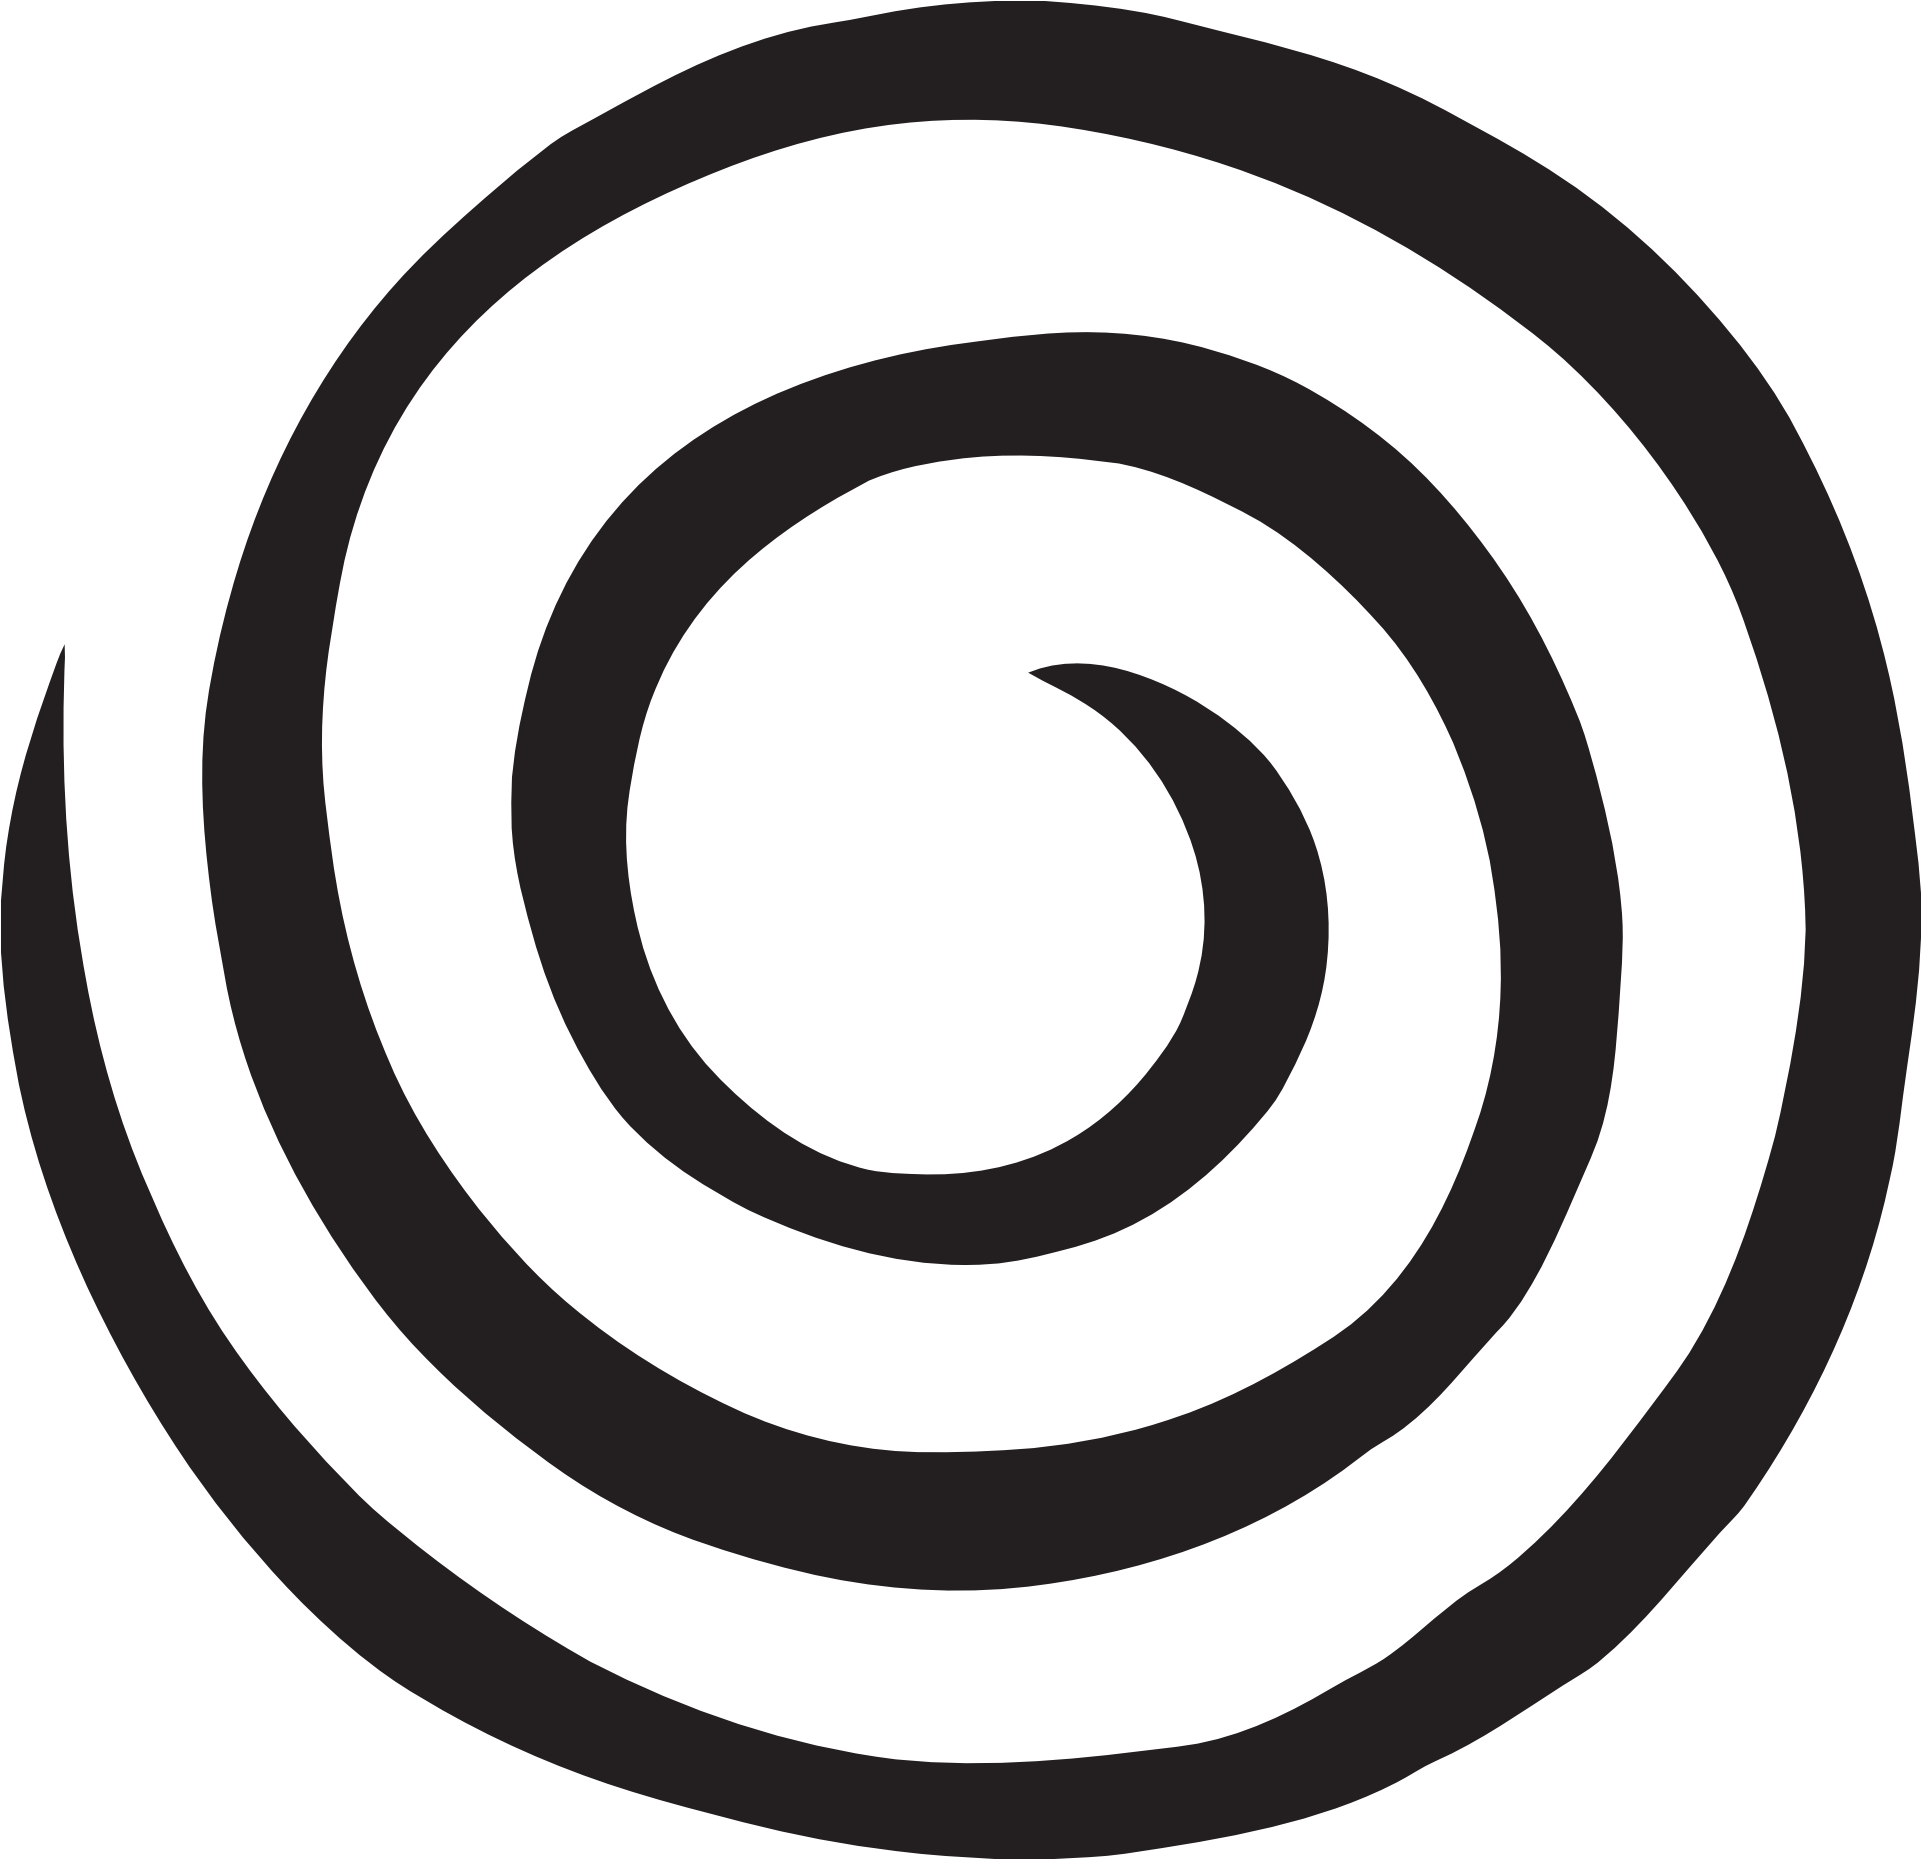 Circle swirl clipart clip transparent download Swirl Pictures - Circle Swirl Transparent Clipart - Full Size ... clip transparent download